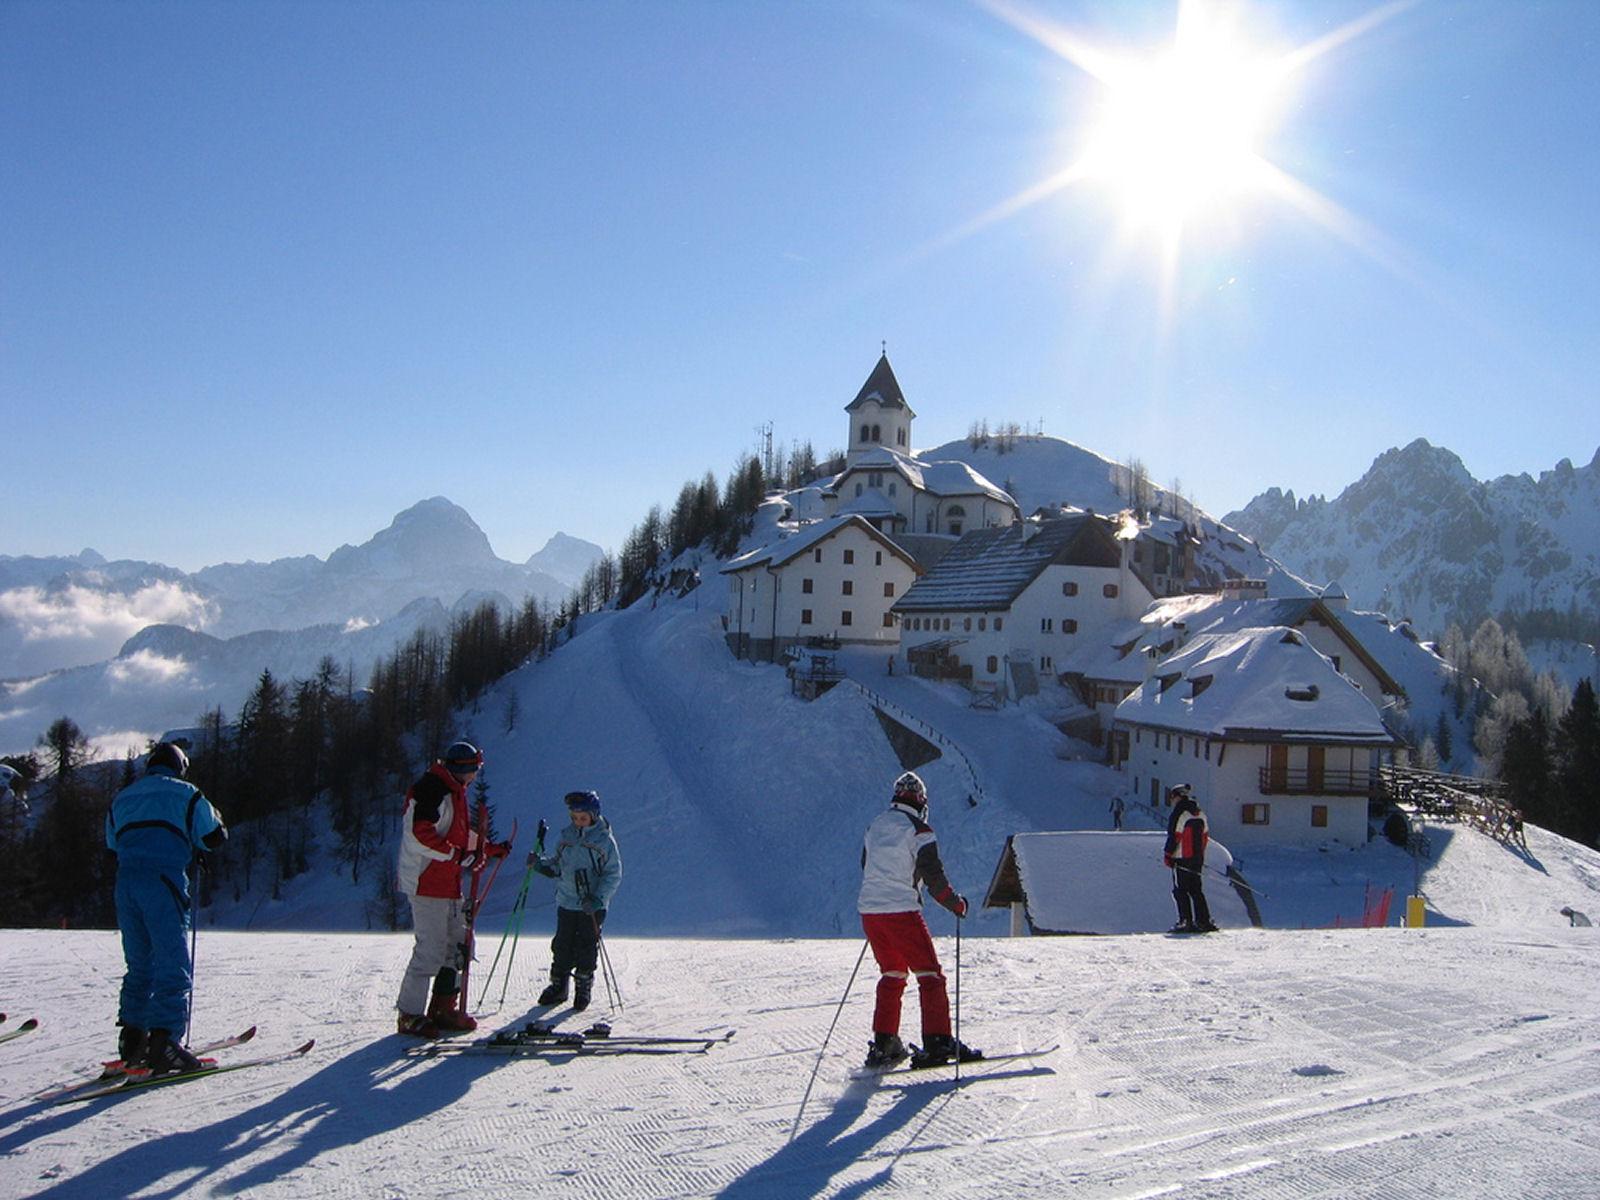 Monte Lussari in winter, Tarvisio, province of Udine, region Friuli-Venezia Giulia, Italy